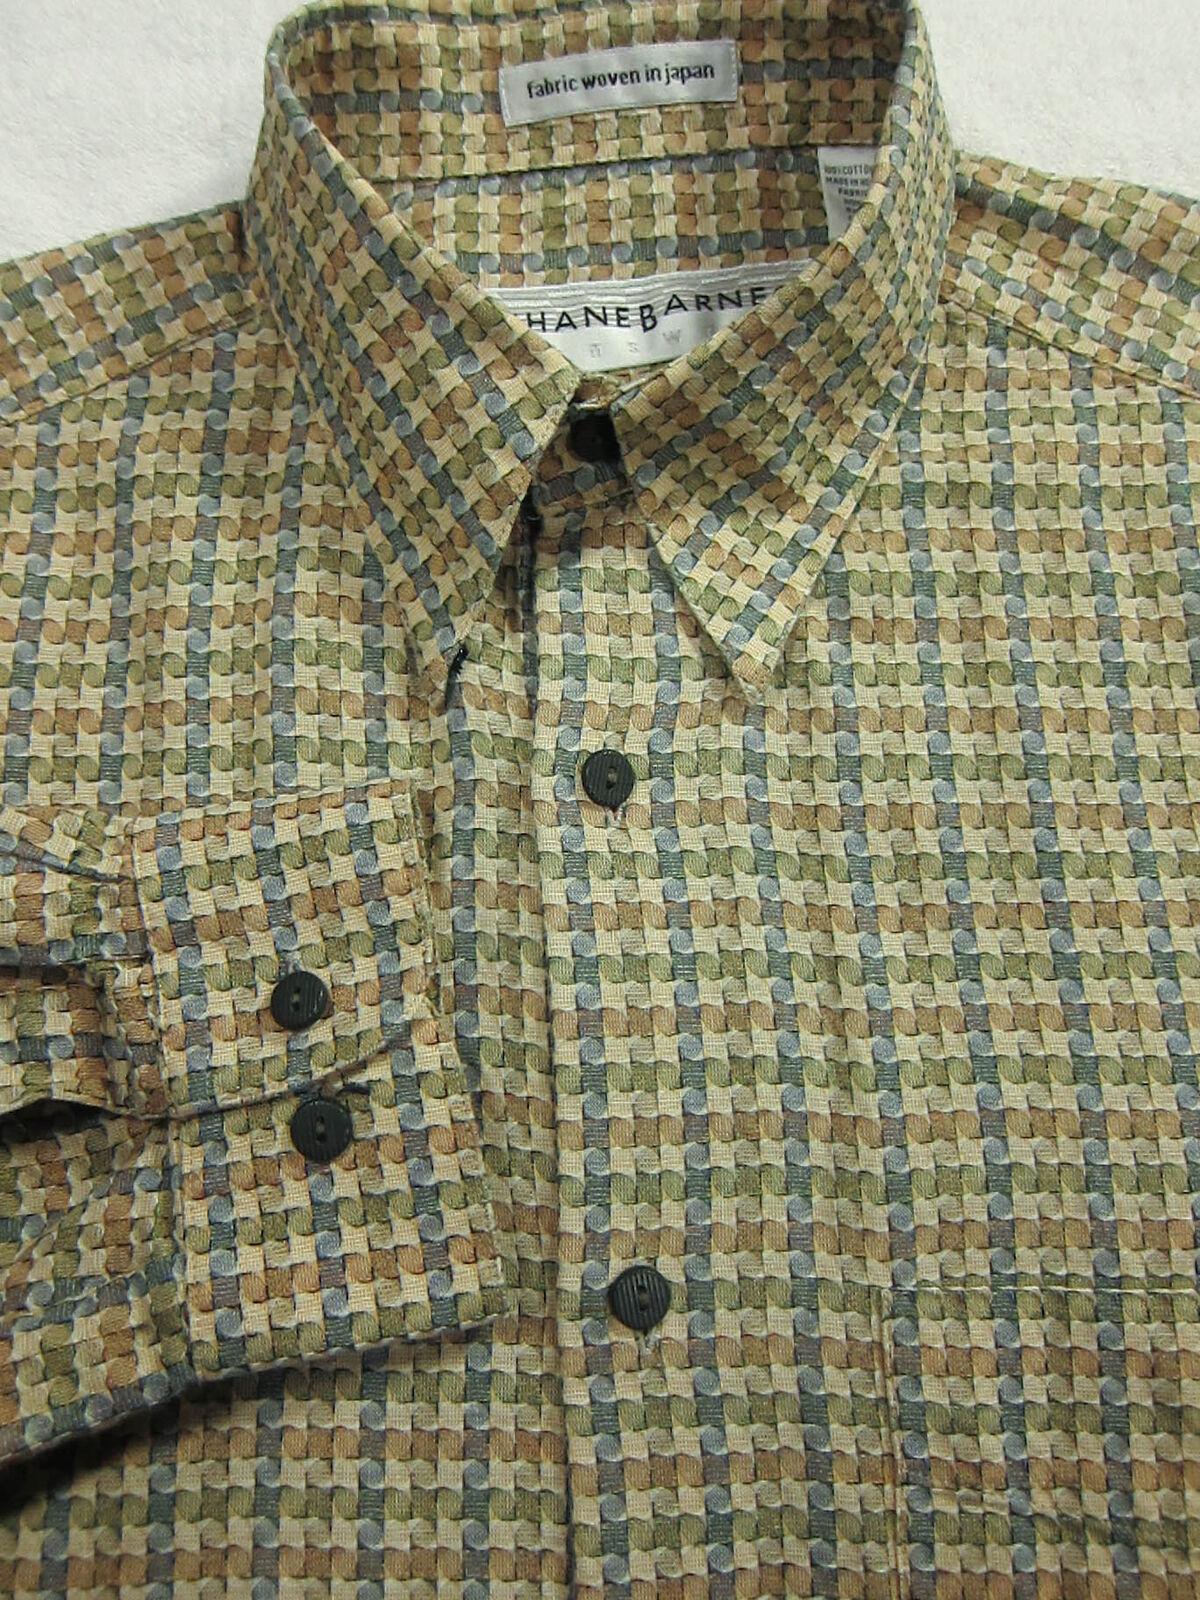 GORGEOUS Jhane Barnes Japan Cotton Tan With Circles Shirt S 15.5x32